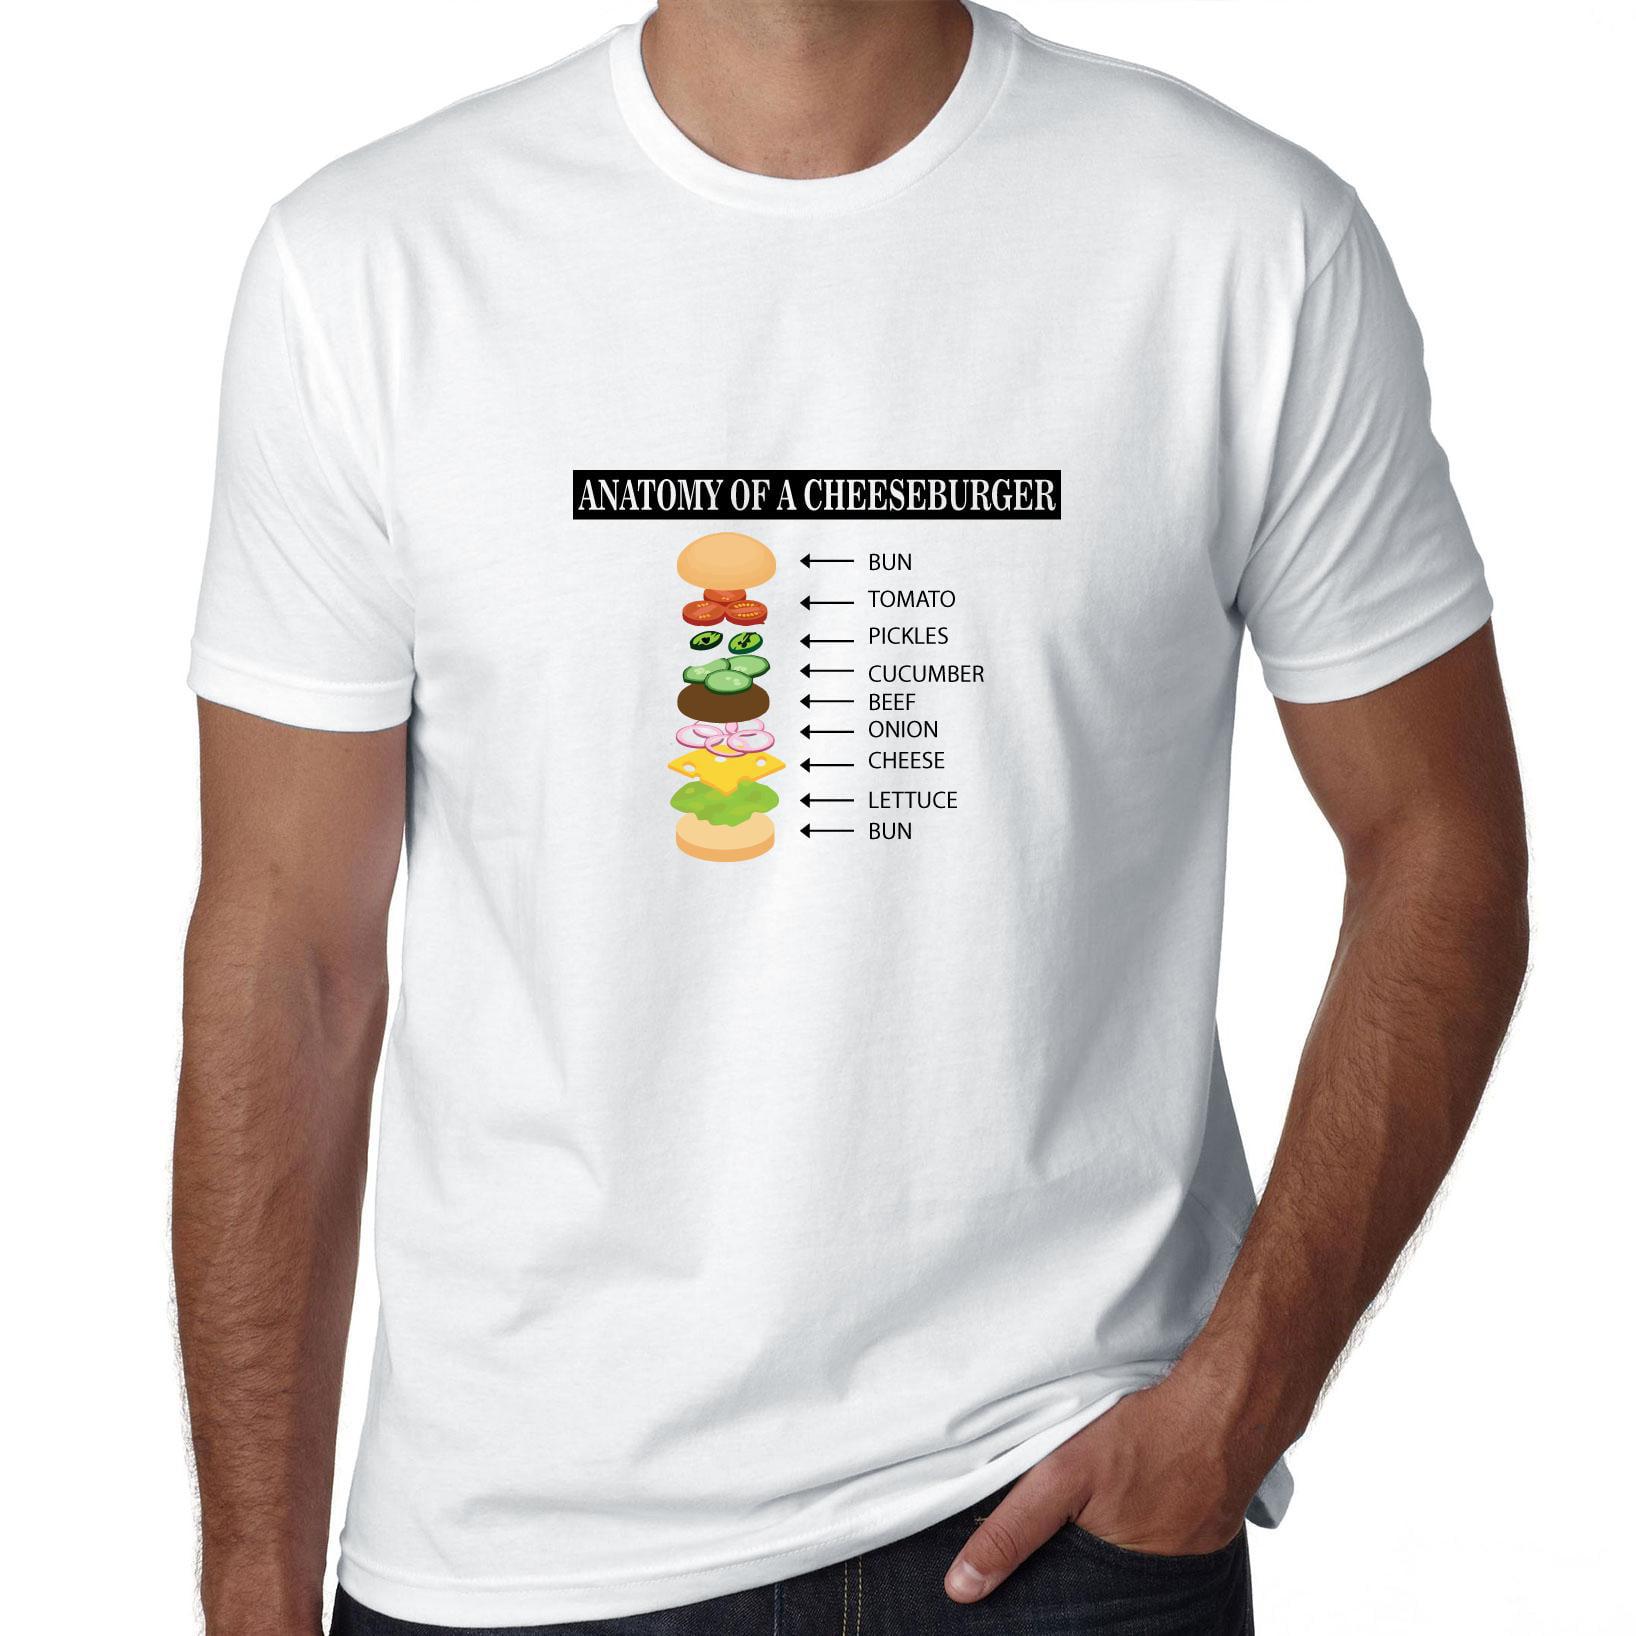 Anatomy Of The Cheeseburger Cool Graphic Men's T-Shirt